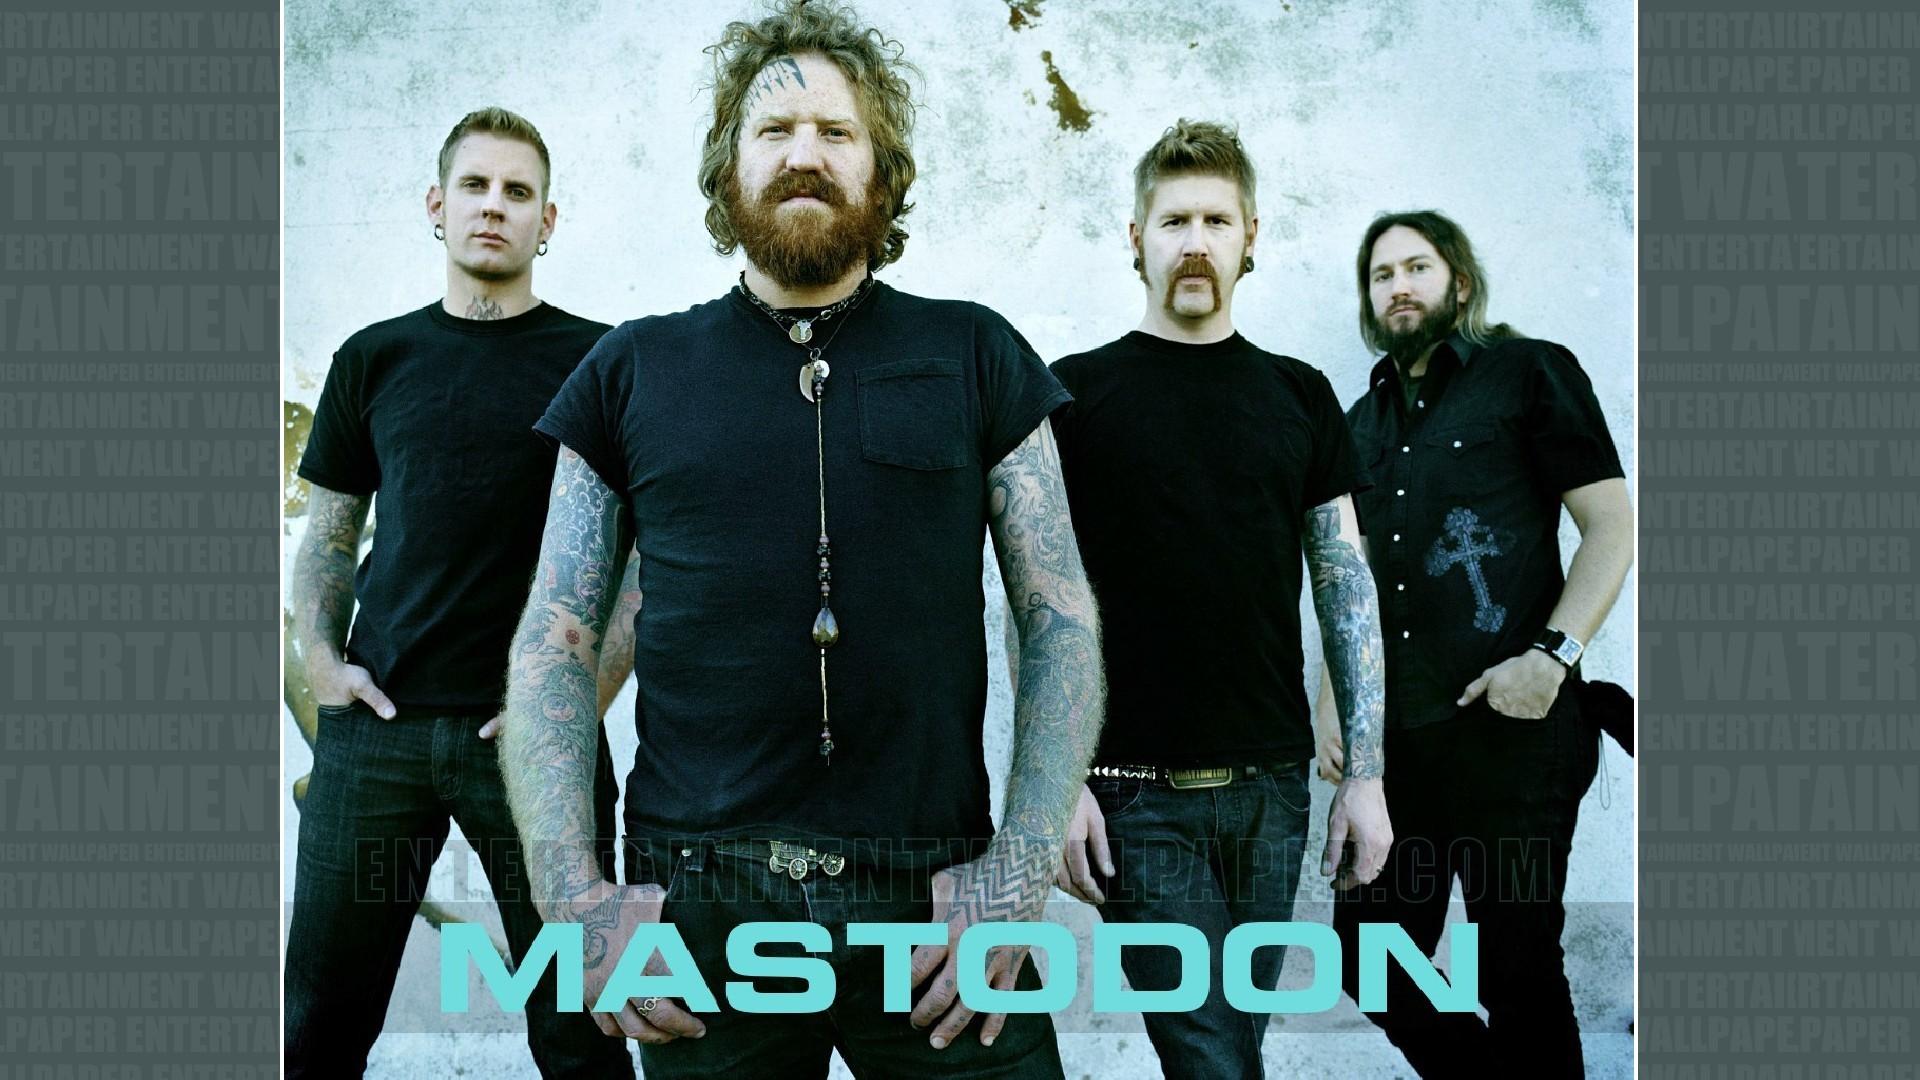 Mastodon Wallpaper – Original size, download now.